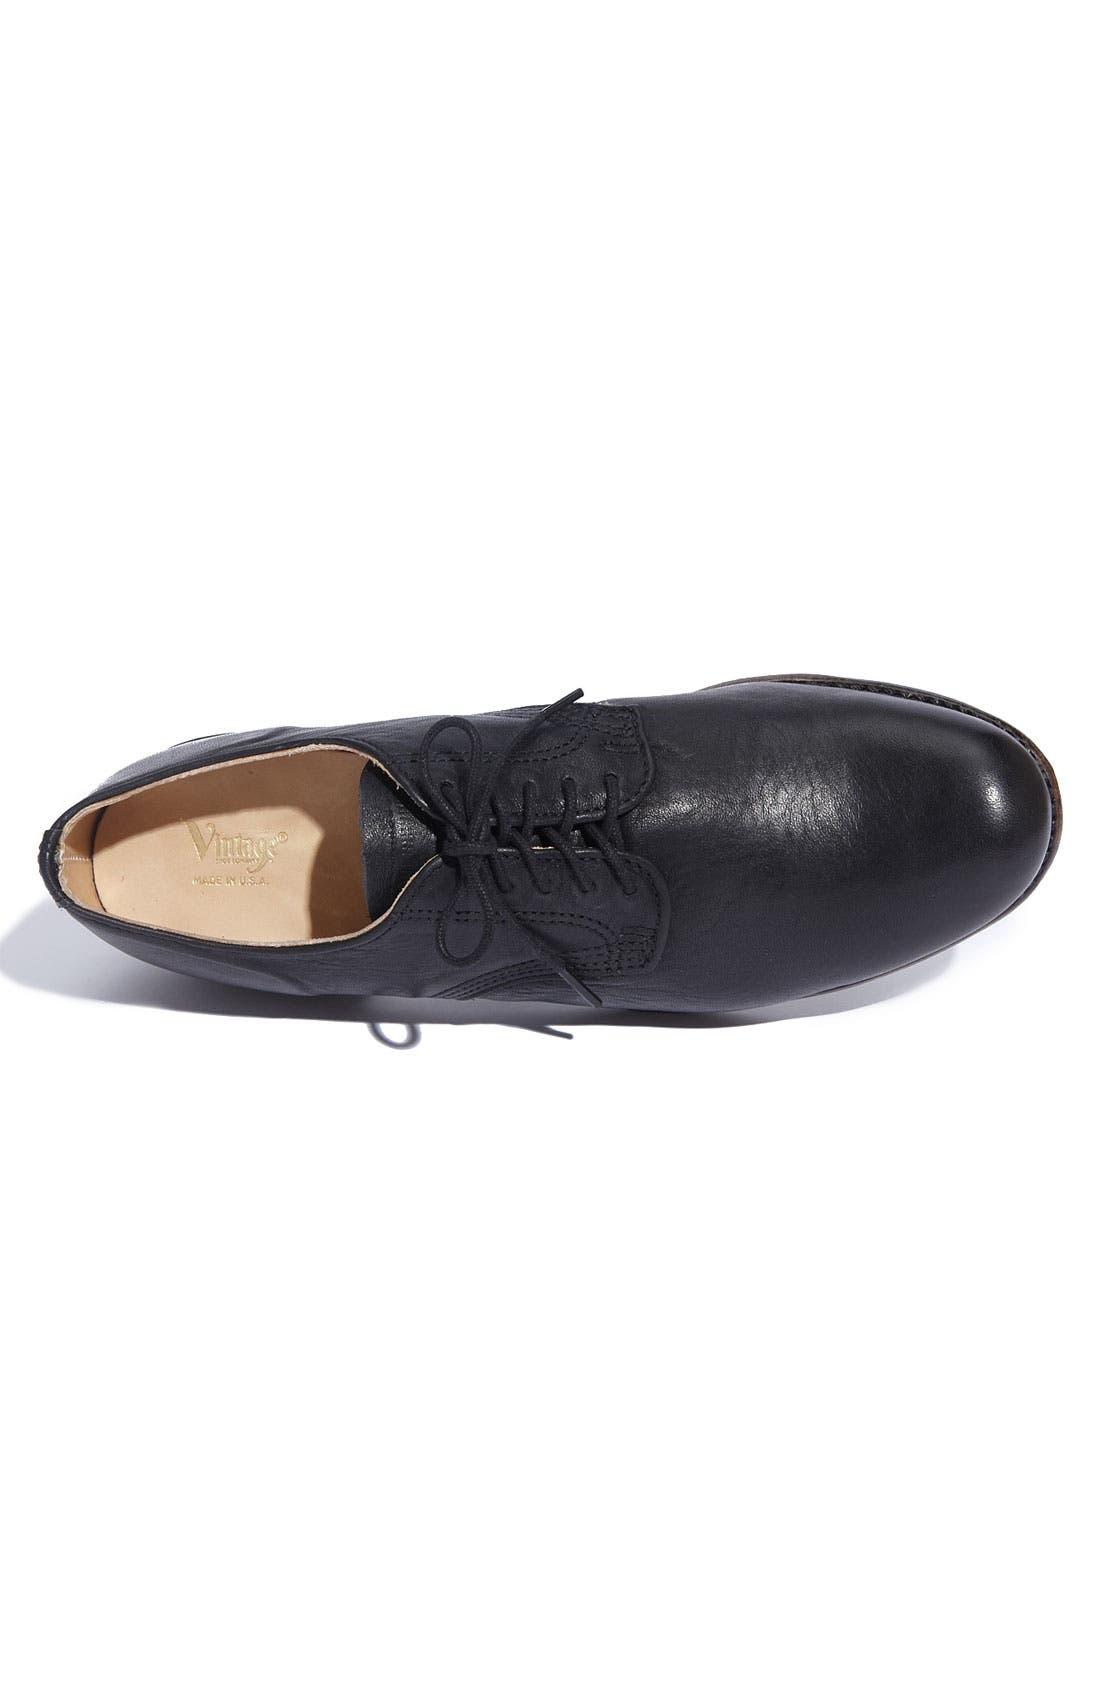 Alternate Image 3  - Vintage Shoe Company 'Judson' Oxford